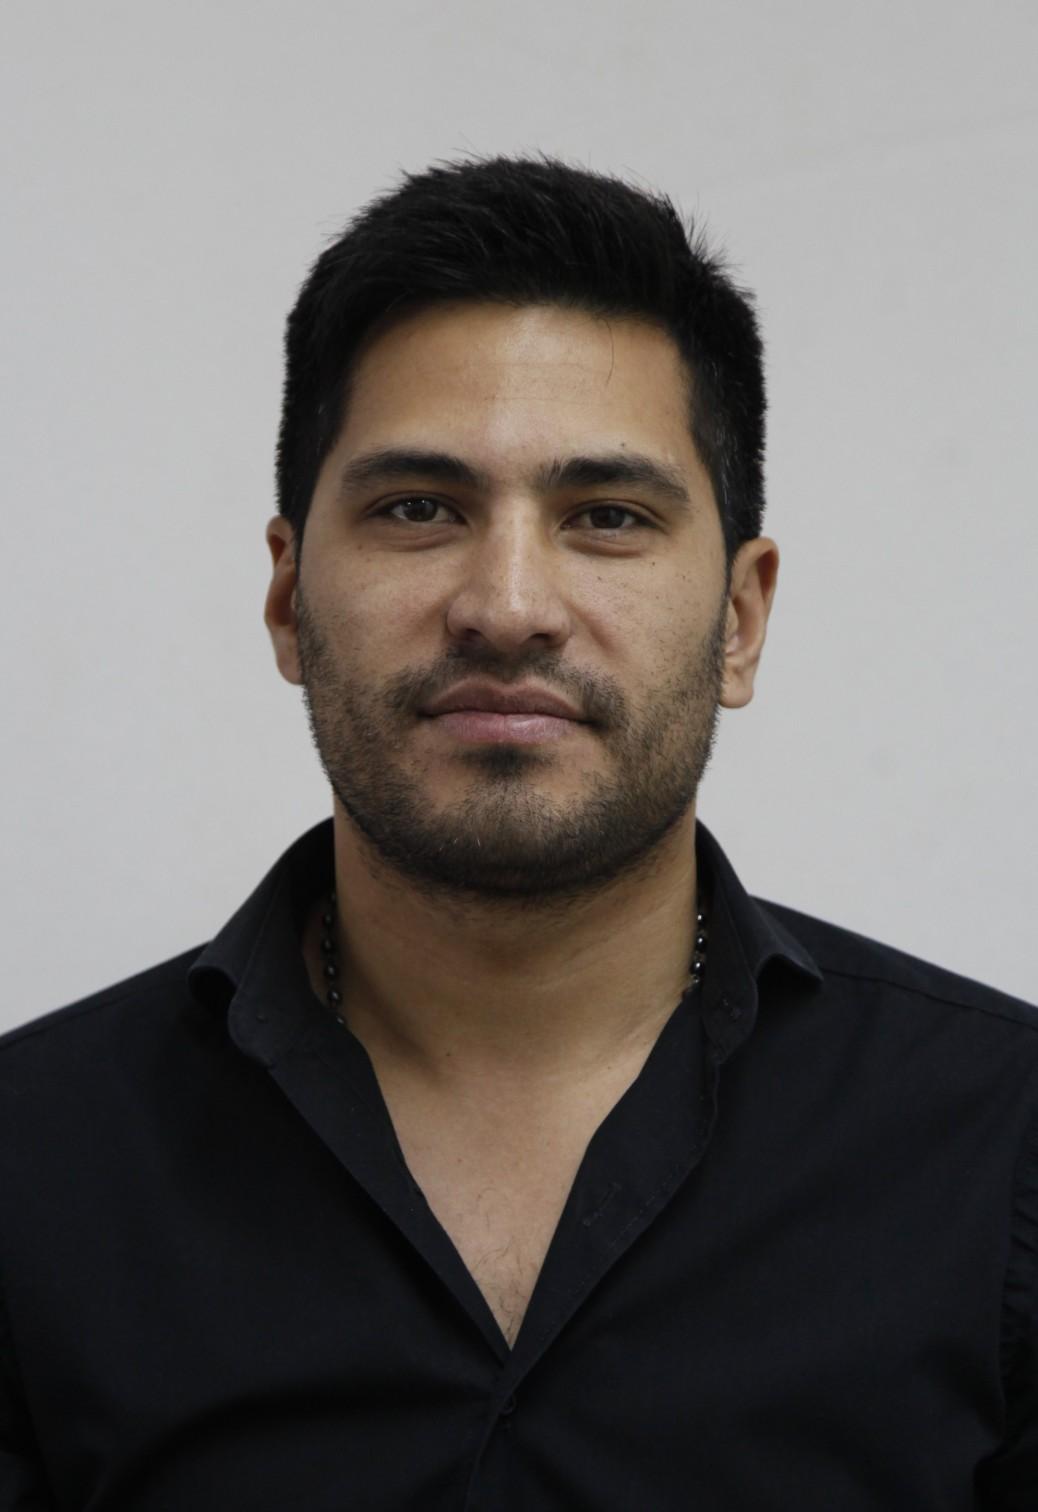 Aguero, Pablo Ariel 26787010 inspector